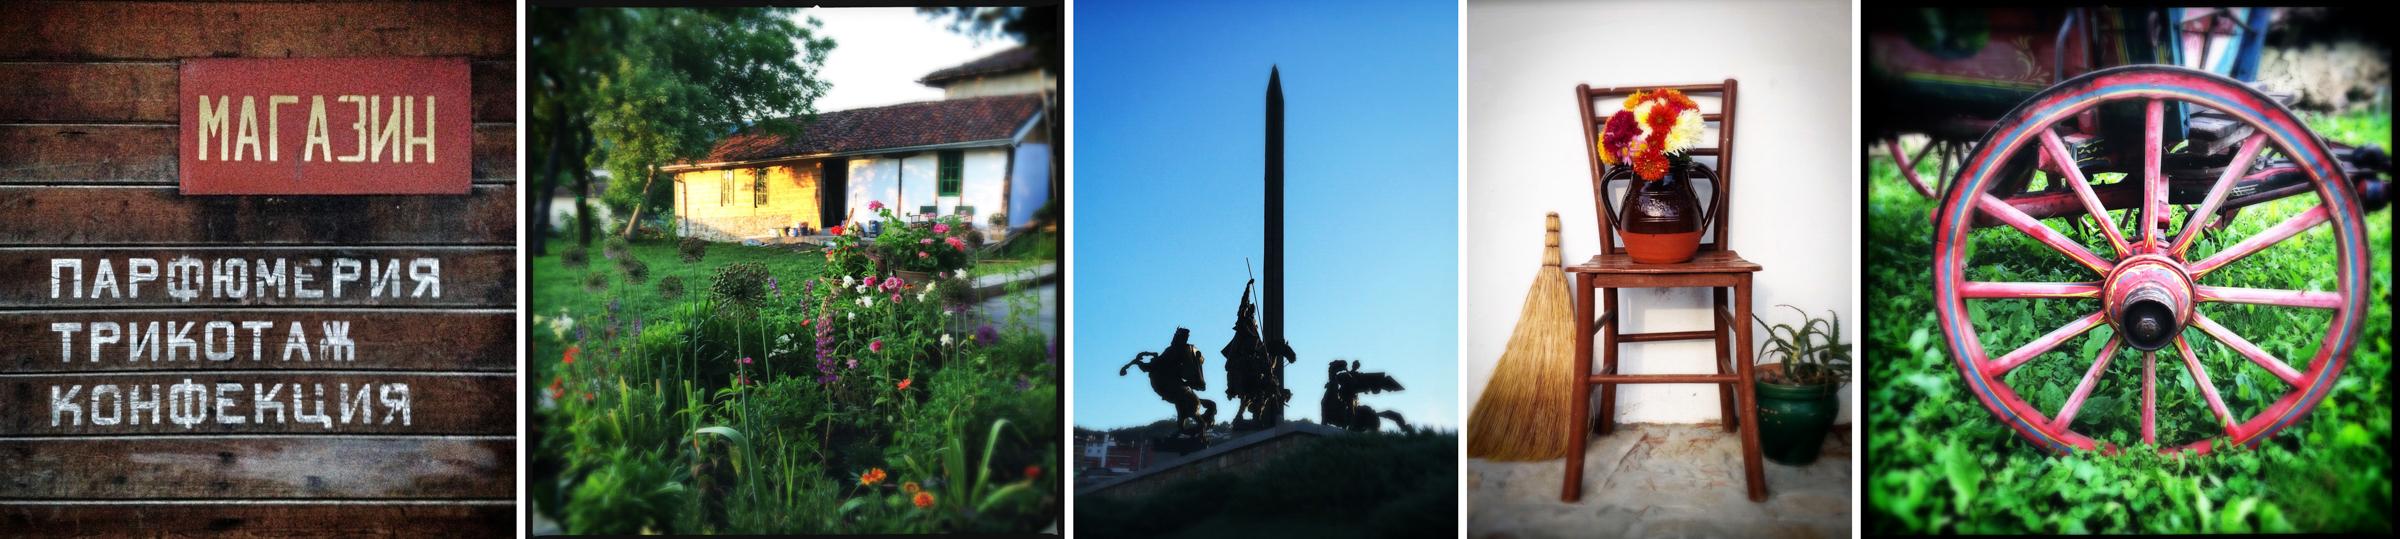 Scenes from Mindya, Bulgaria